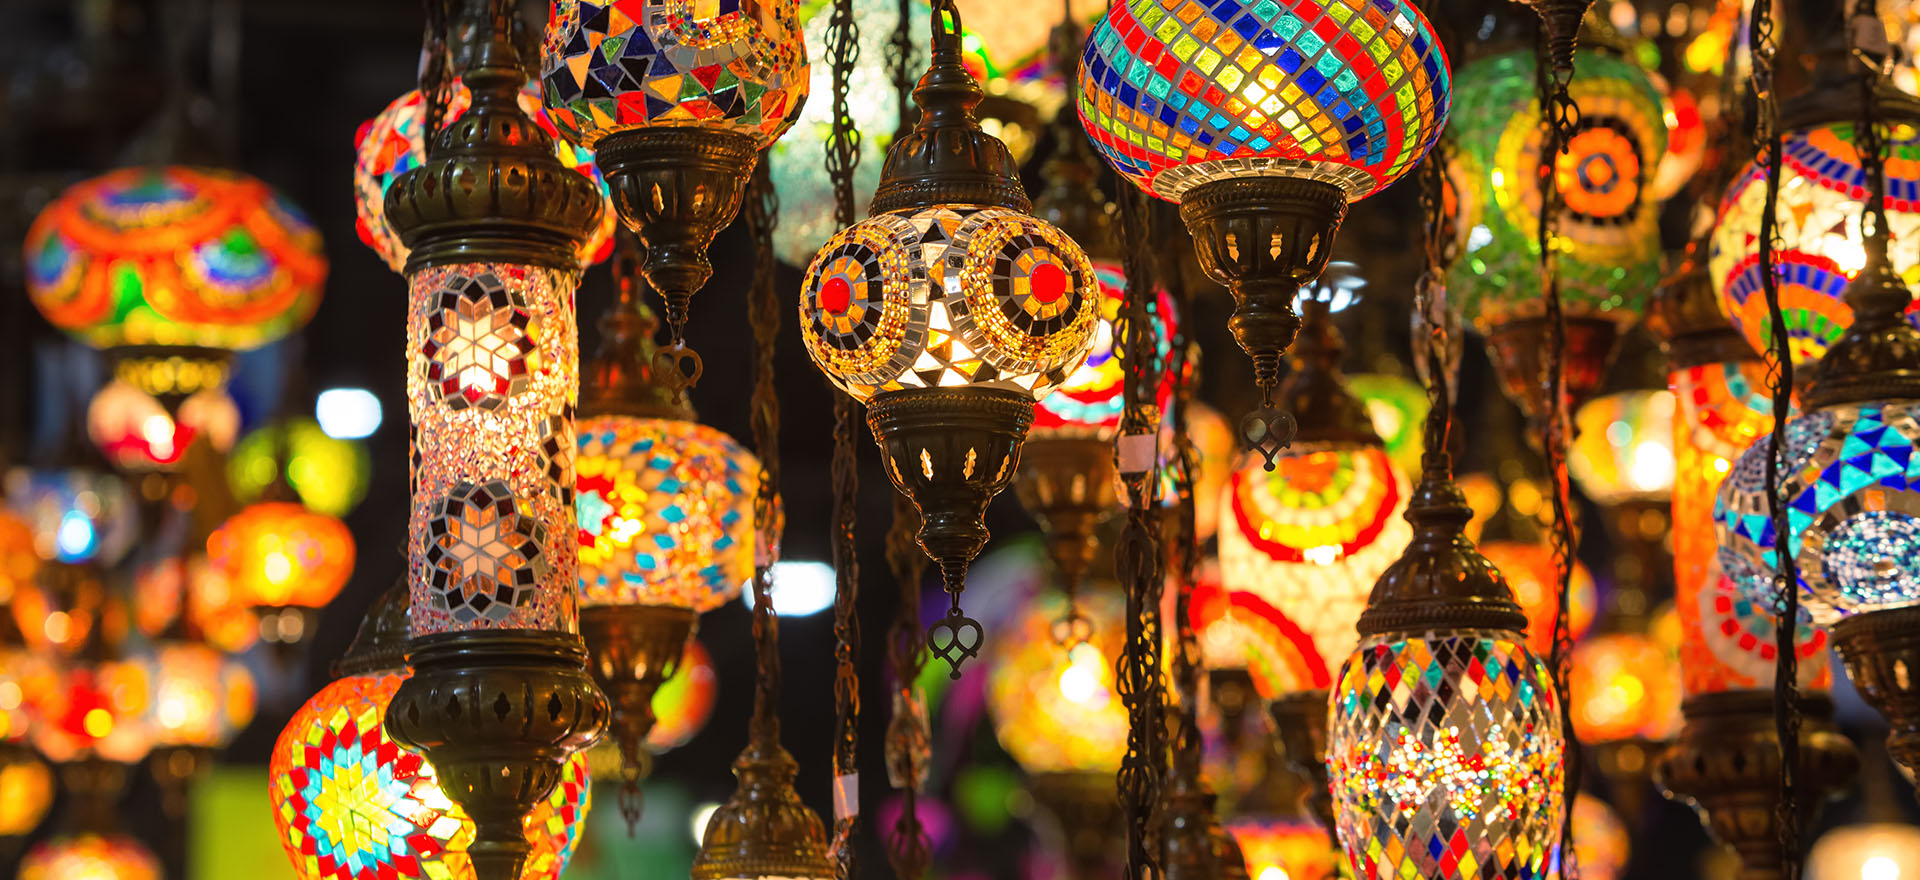 lamps | market | marrakech | morocco